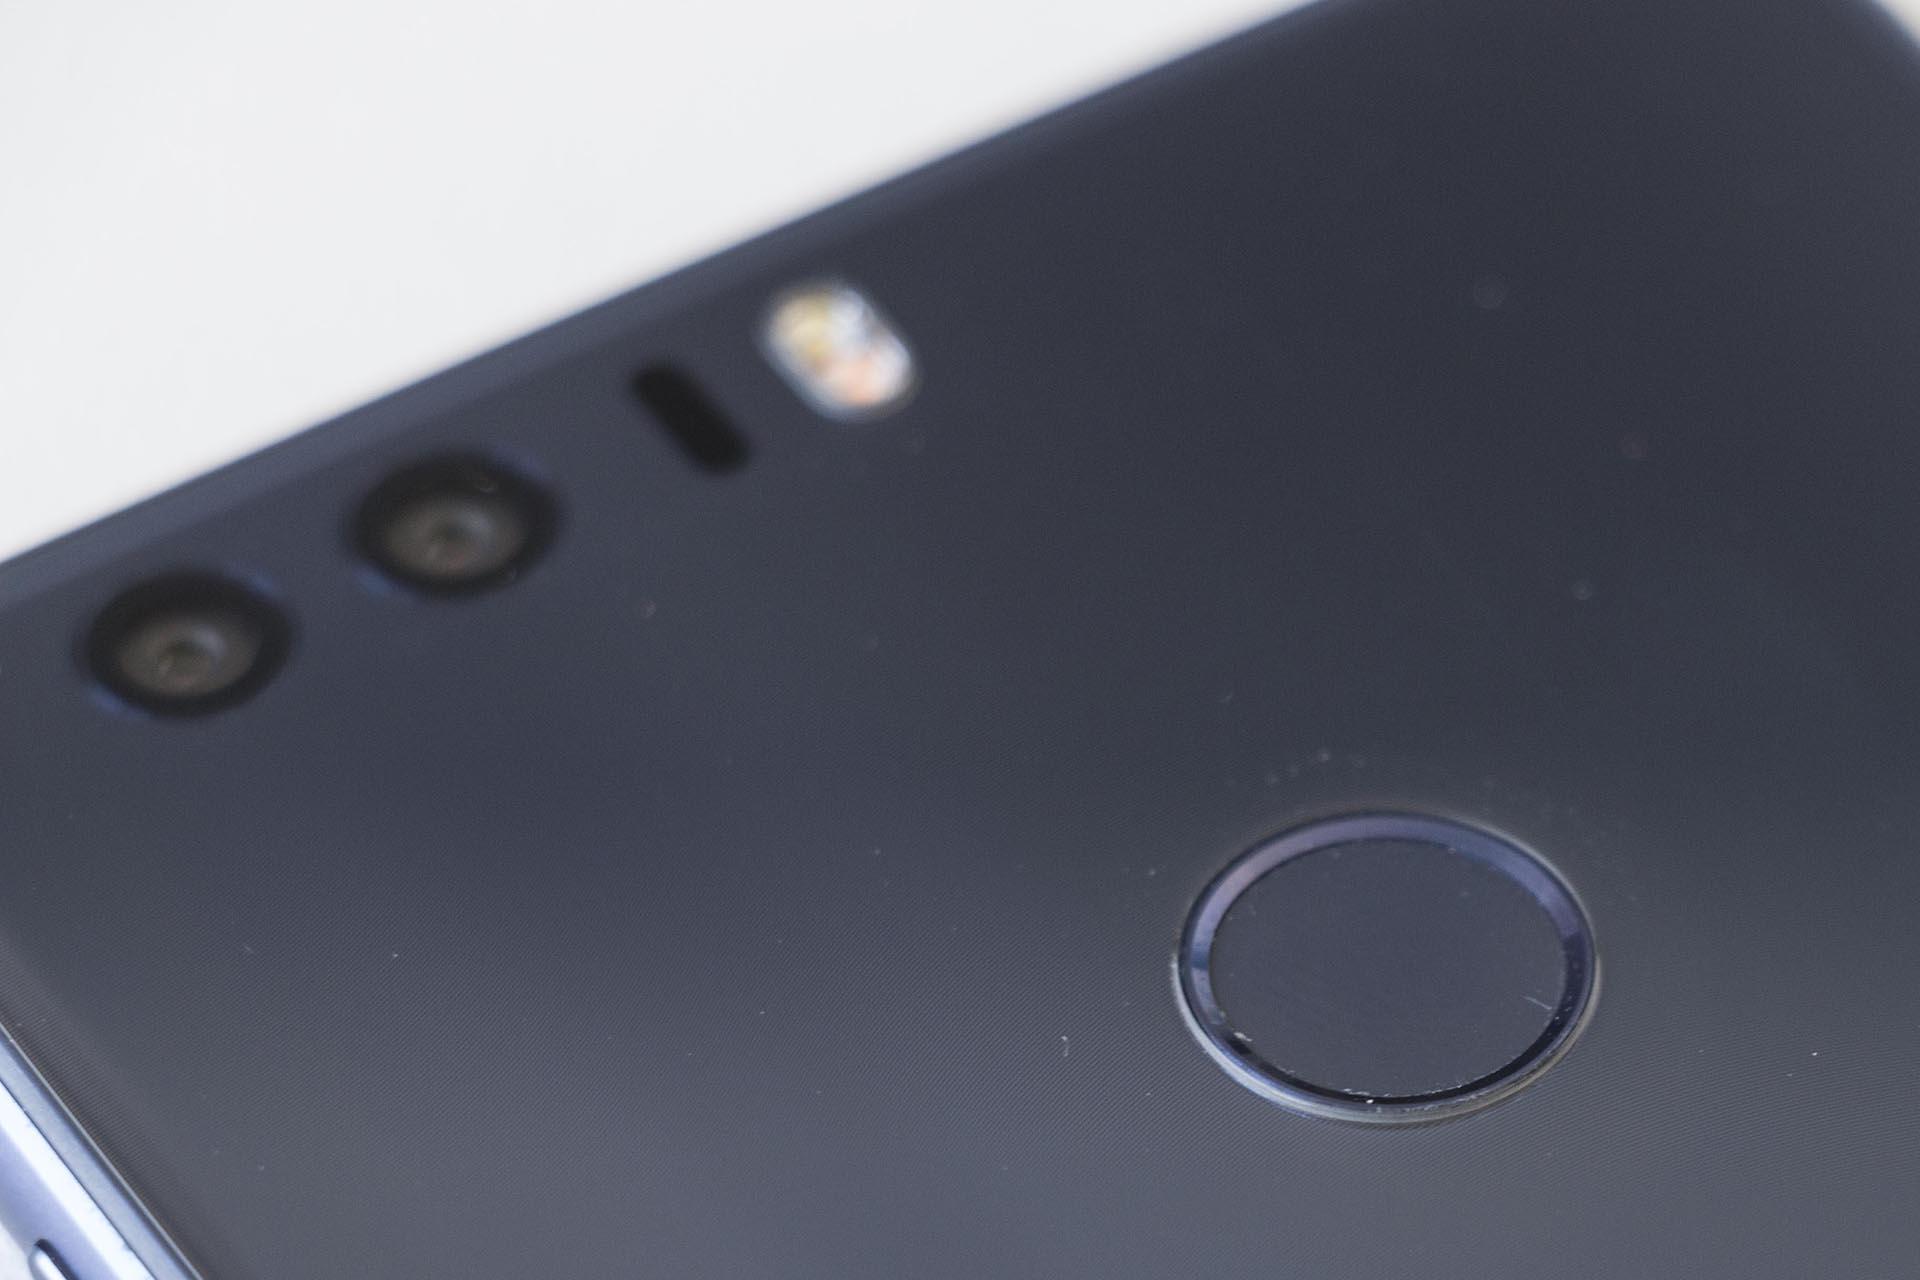 Huawei Honor 8_MG_0715